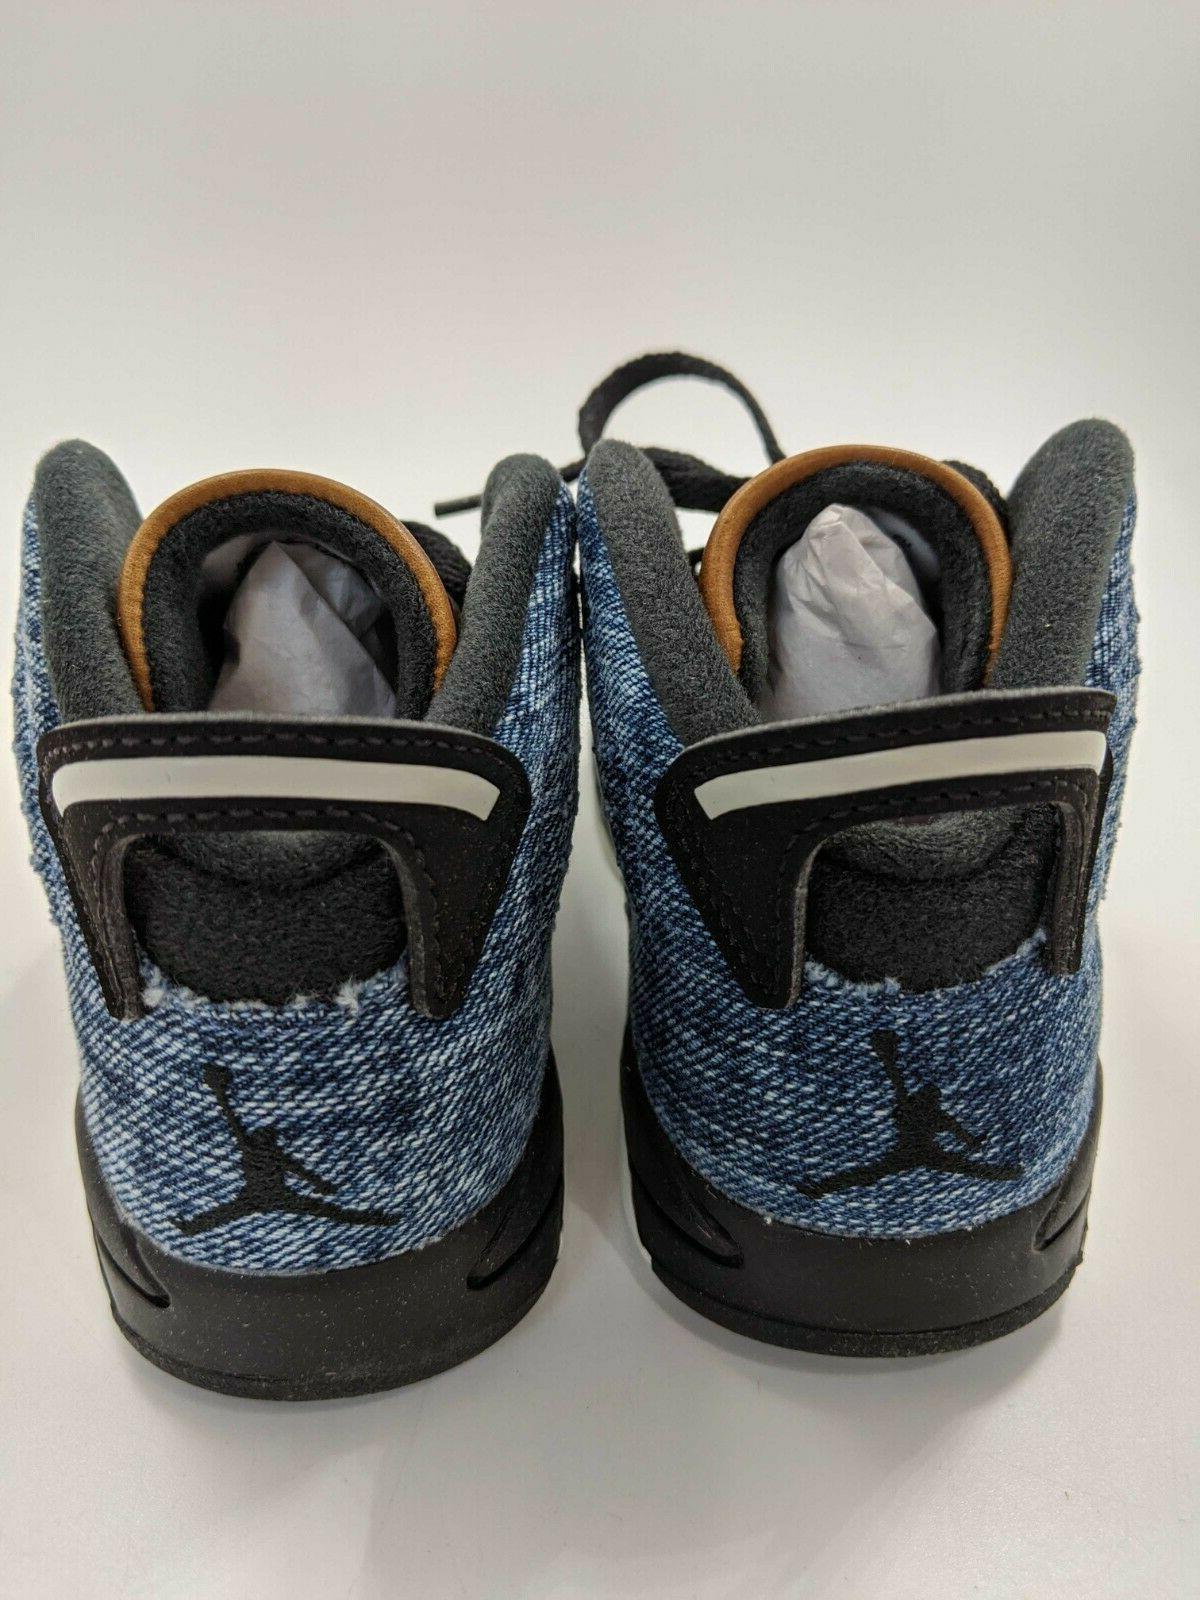 New Boys 6 Basketball Shoes Size 9c-BBK071G2